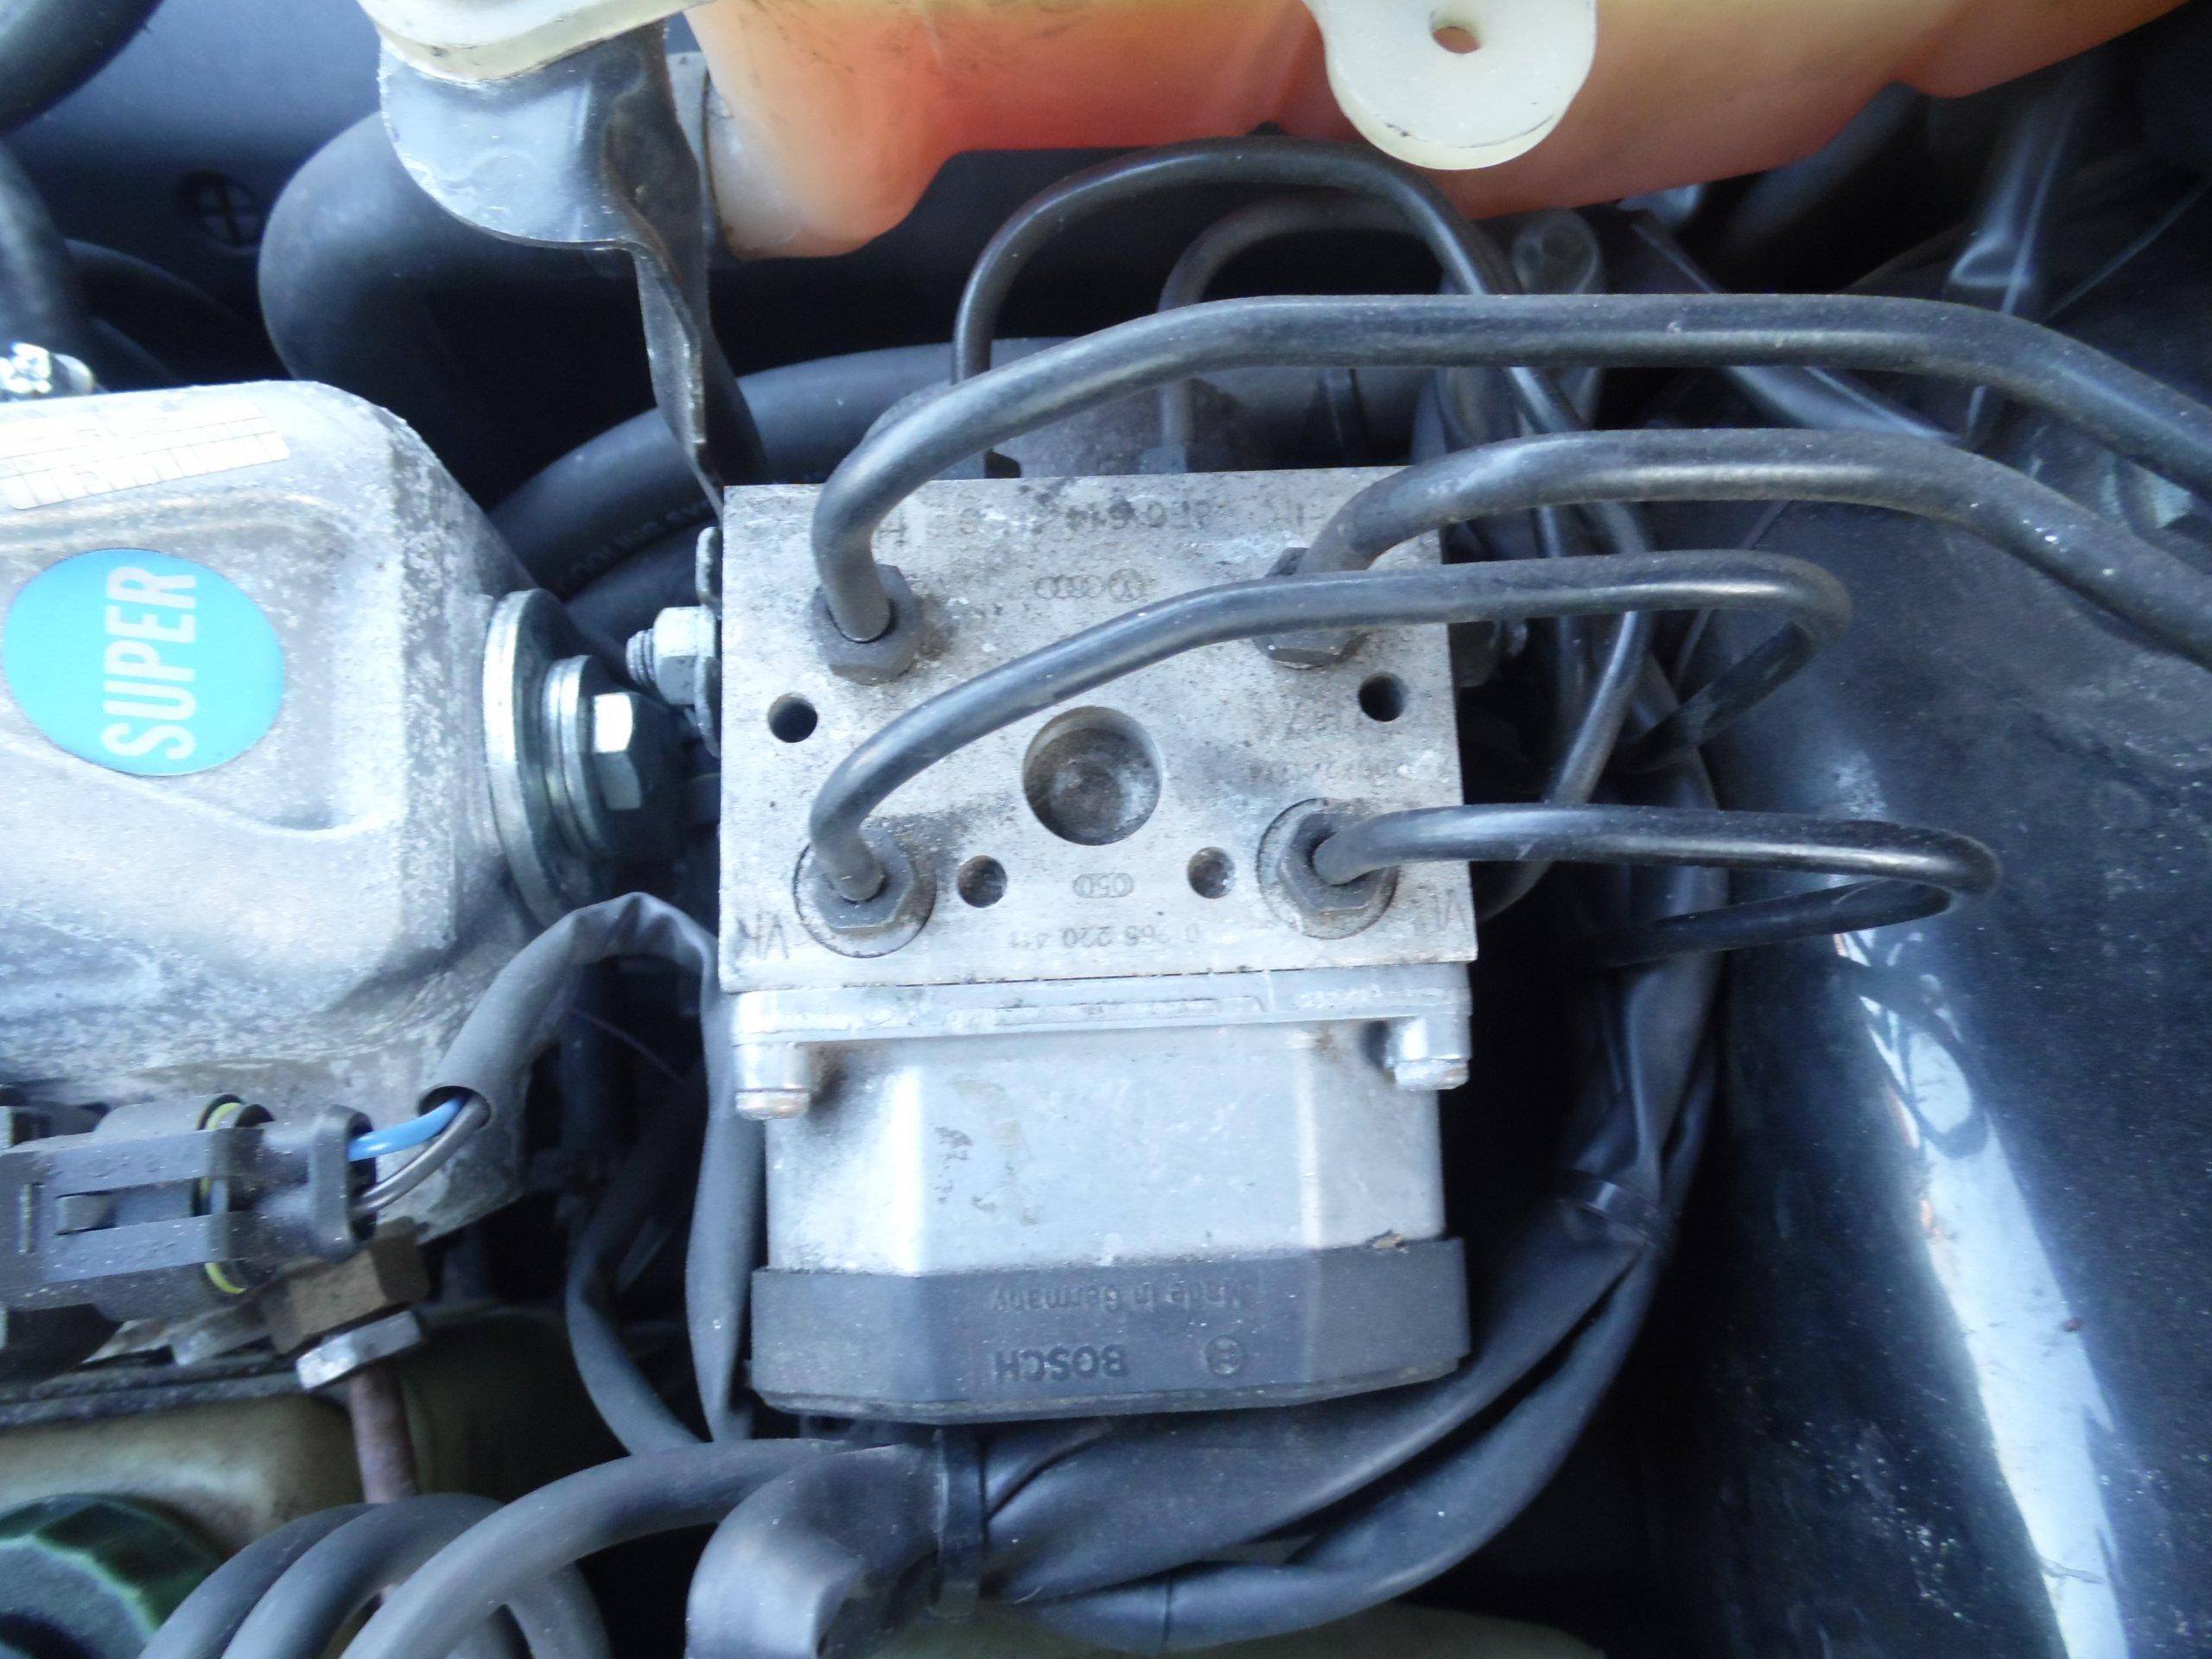 Pompa Sterownik Abs Audi A6 C5 7222836610 Oficjalne Archiwum Allegro